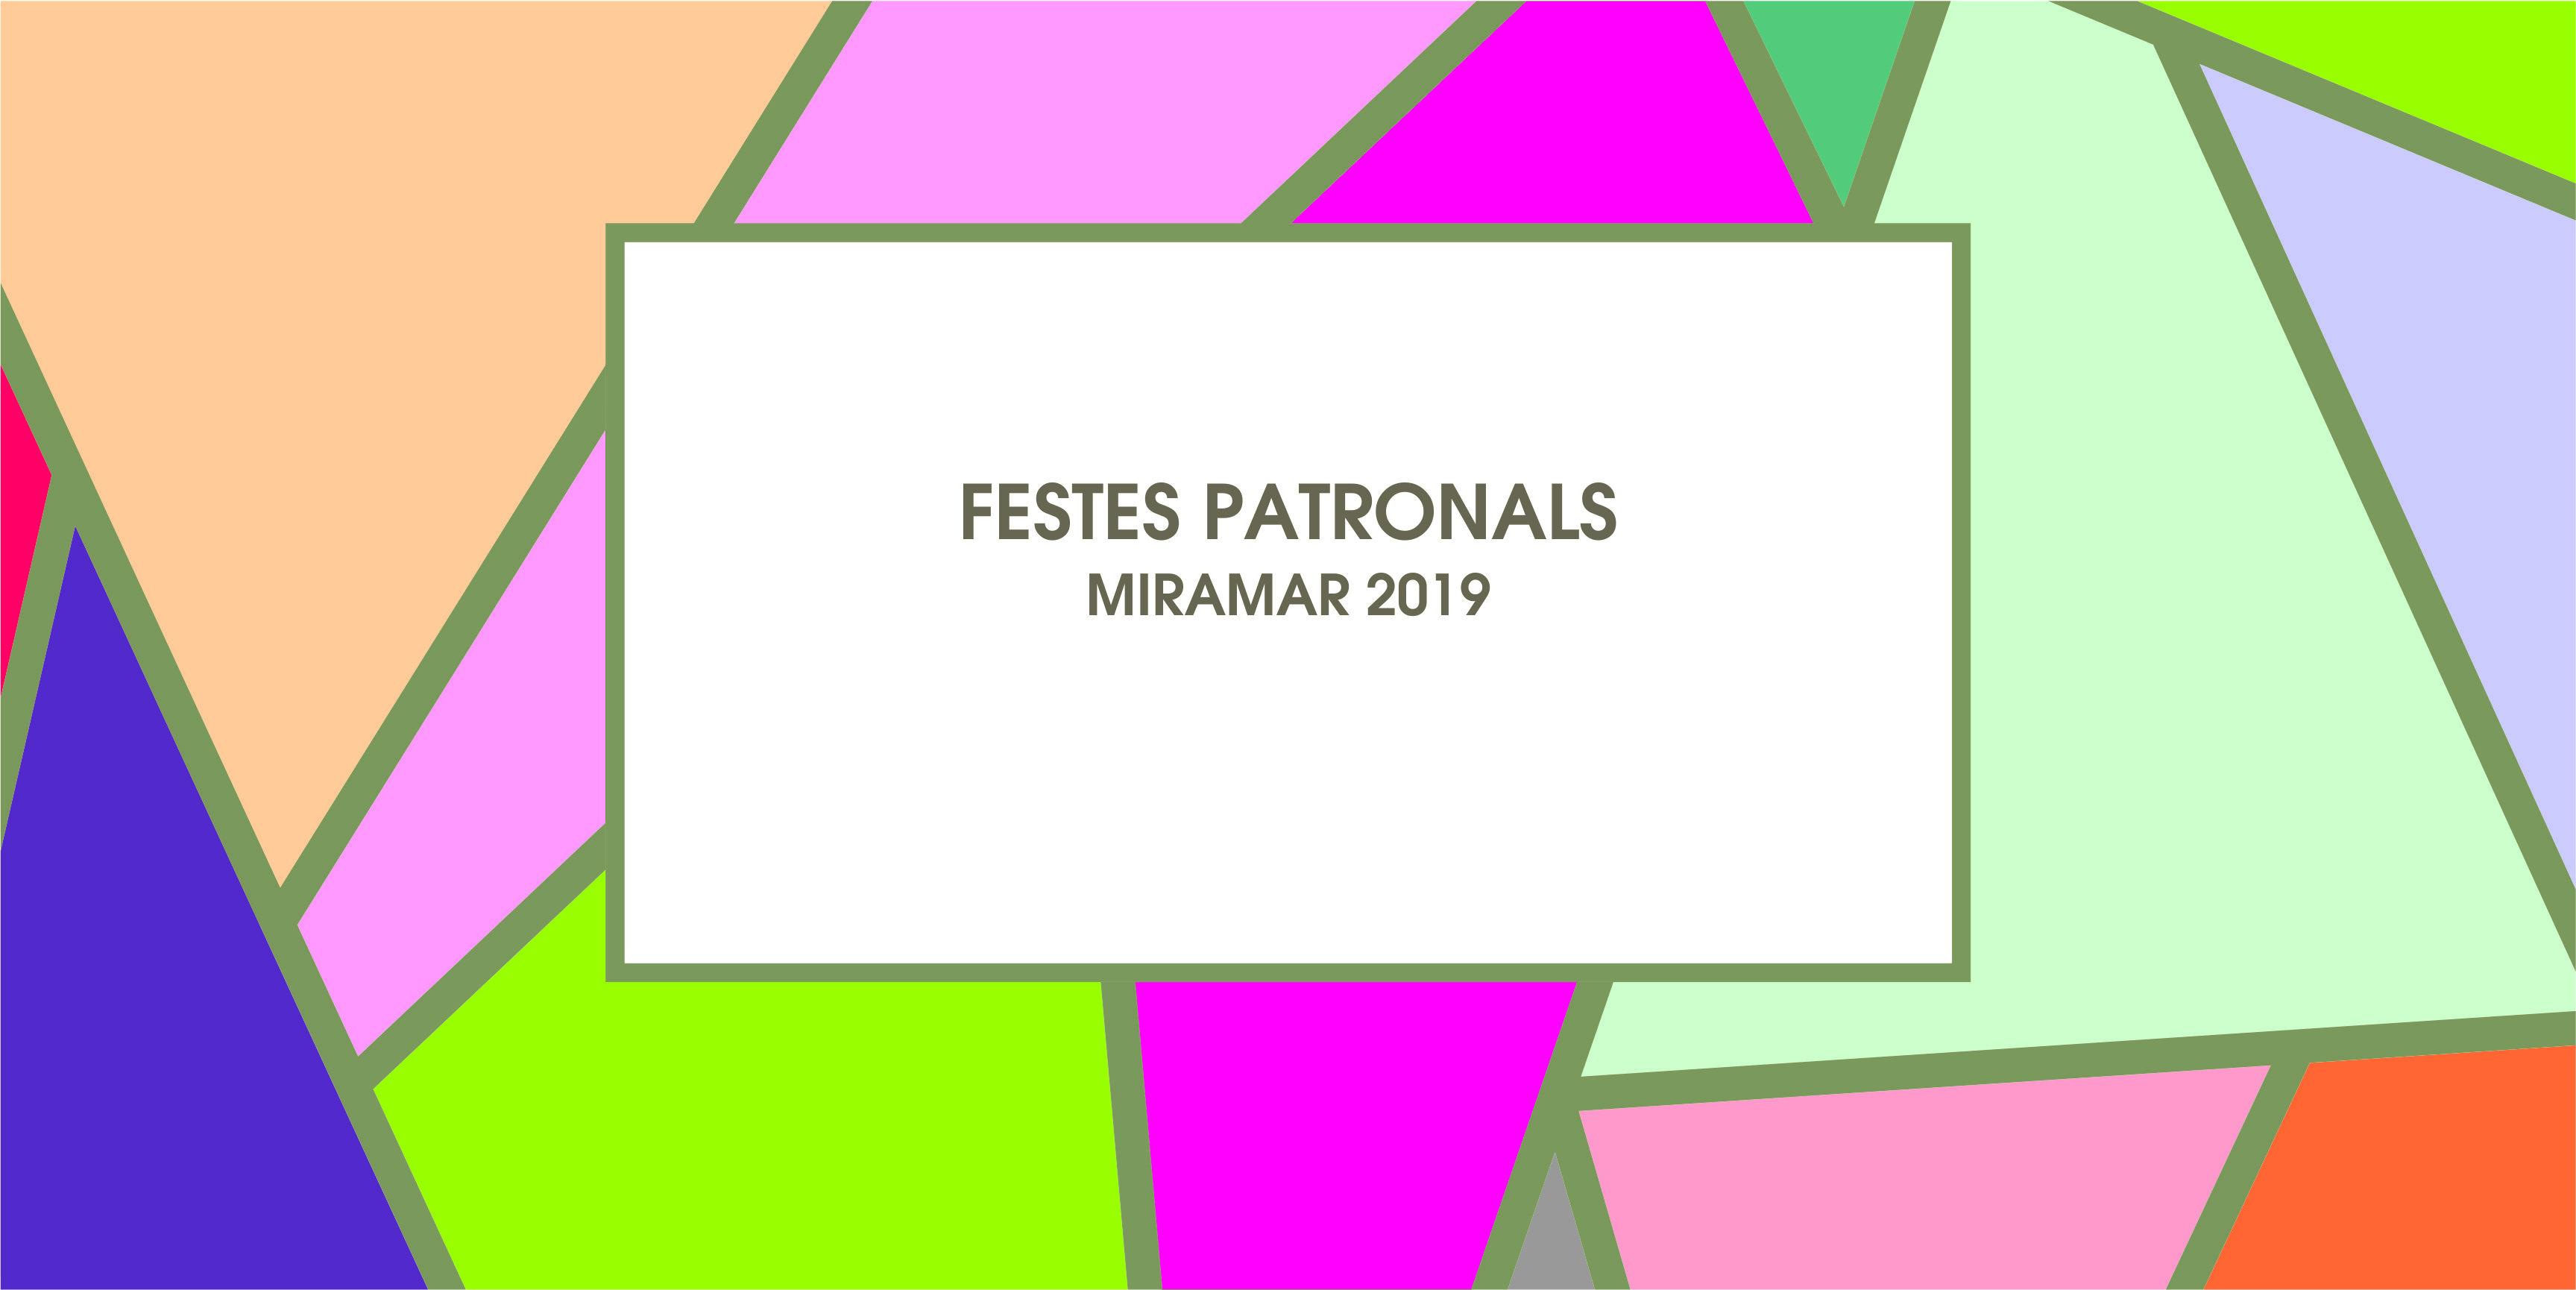 INICI FESTES PATRONALS